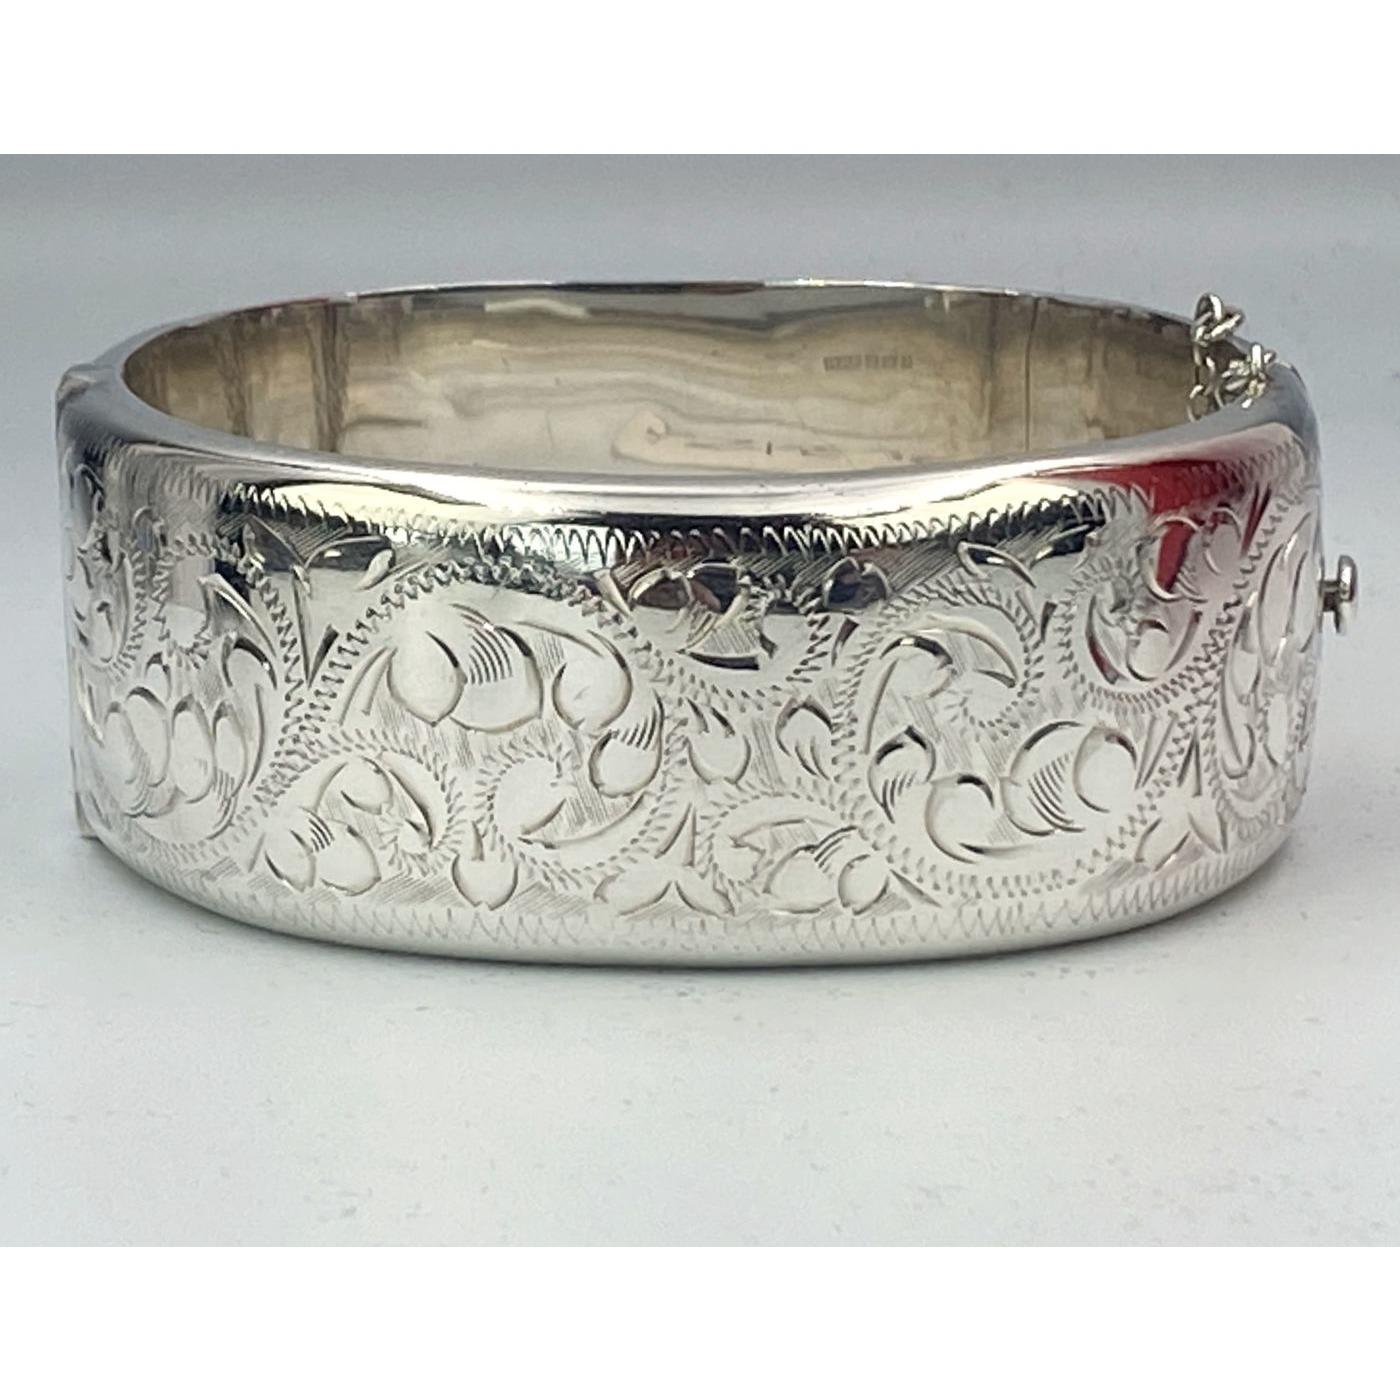 Wide Sweetly Engraved Swirls Antique Silver English Bangle - Generous